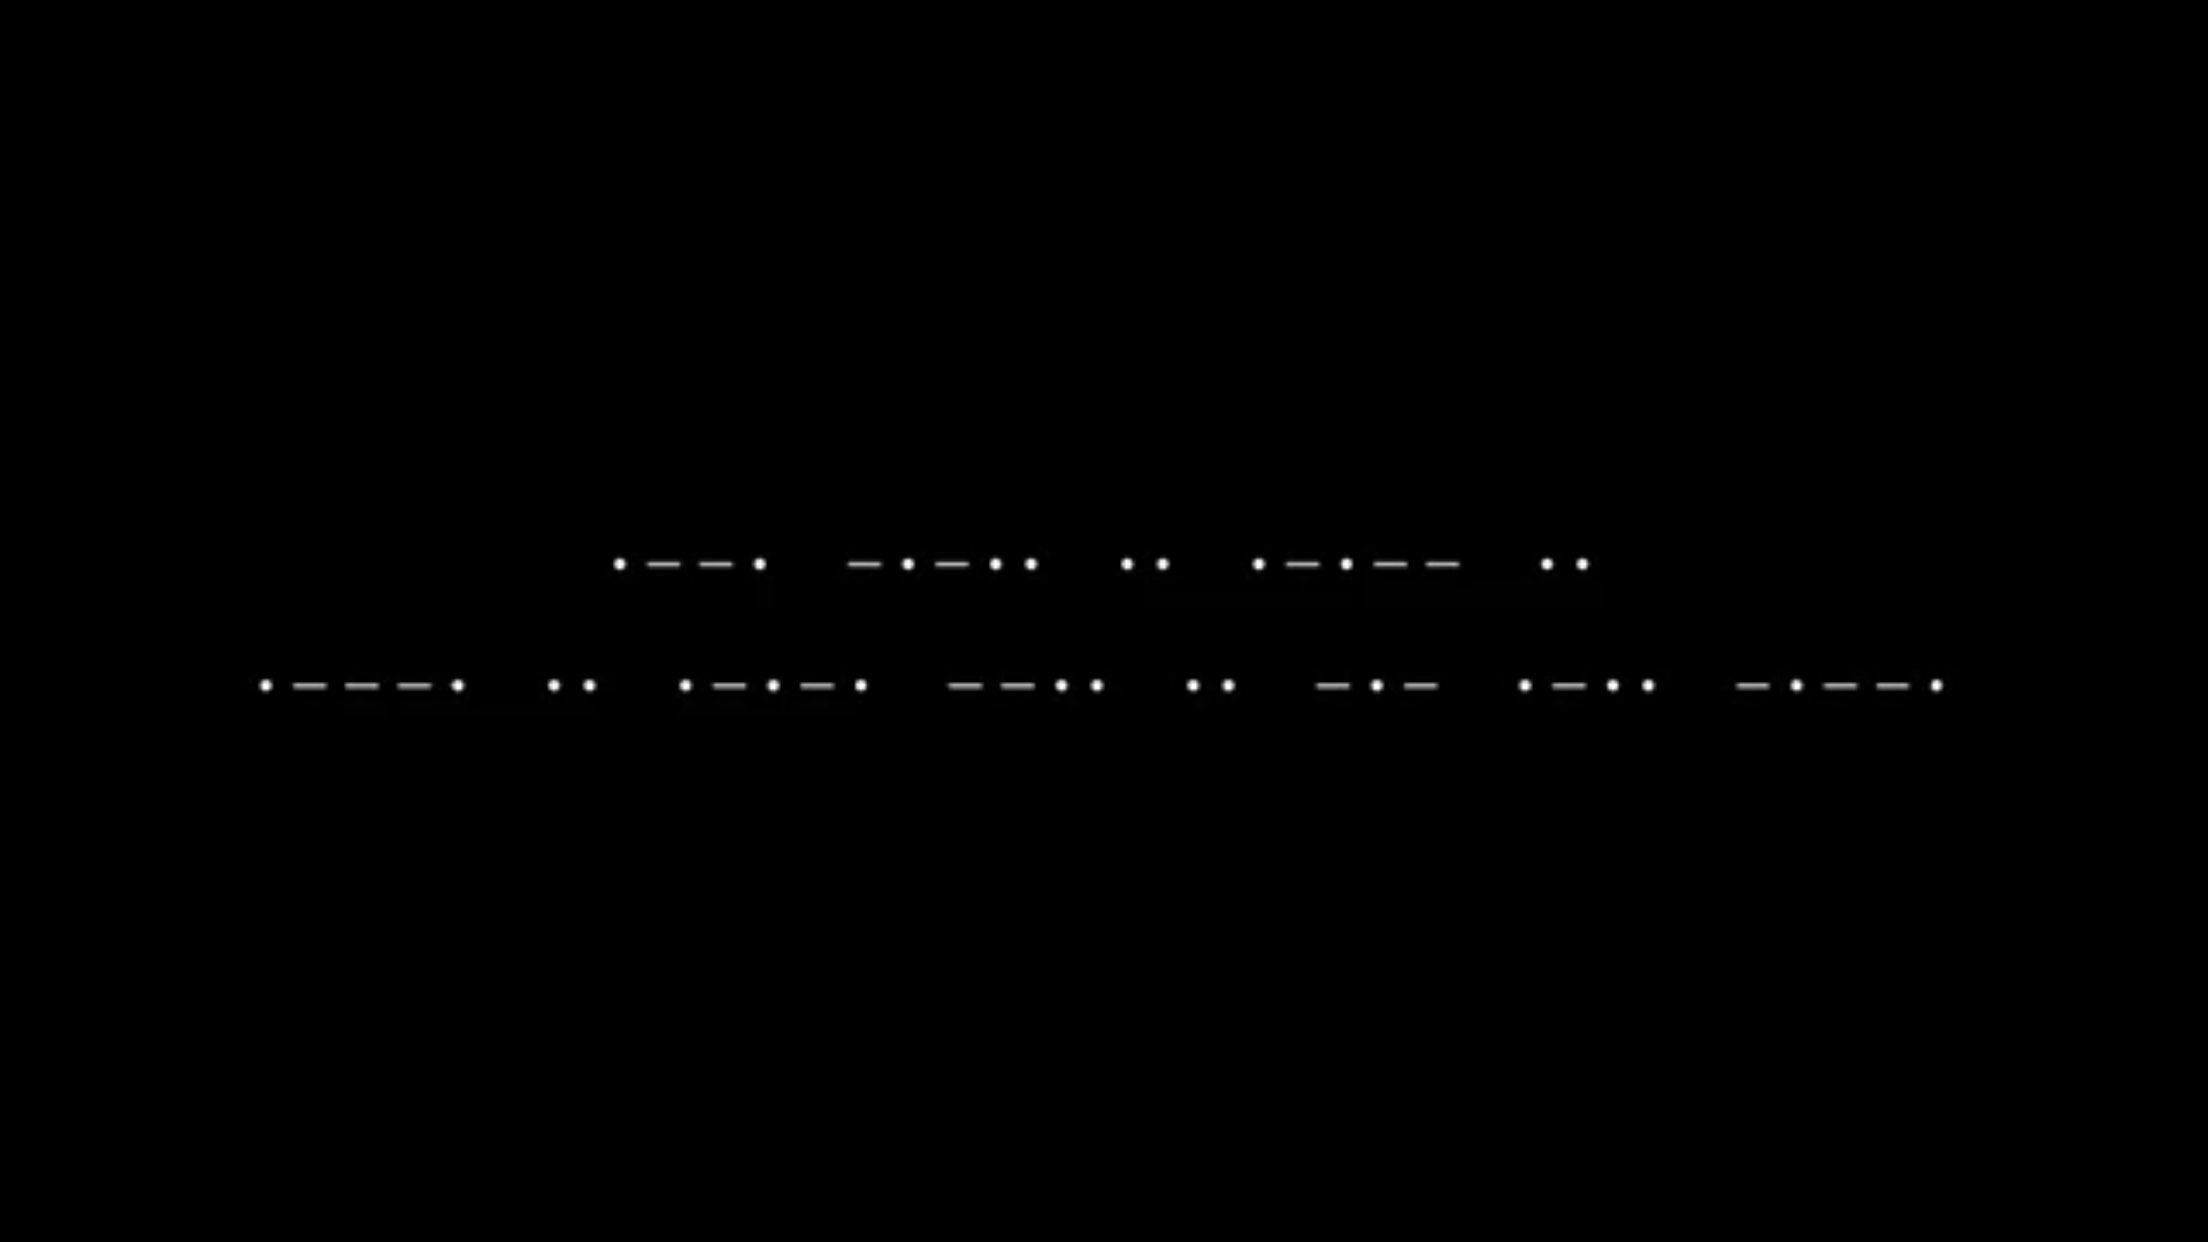 f:id:teajo:20200208002134p:image